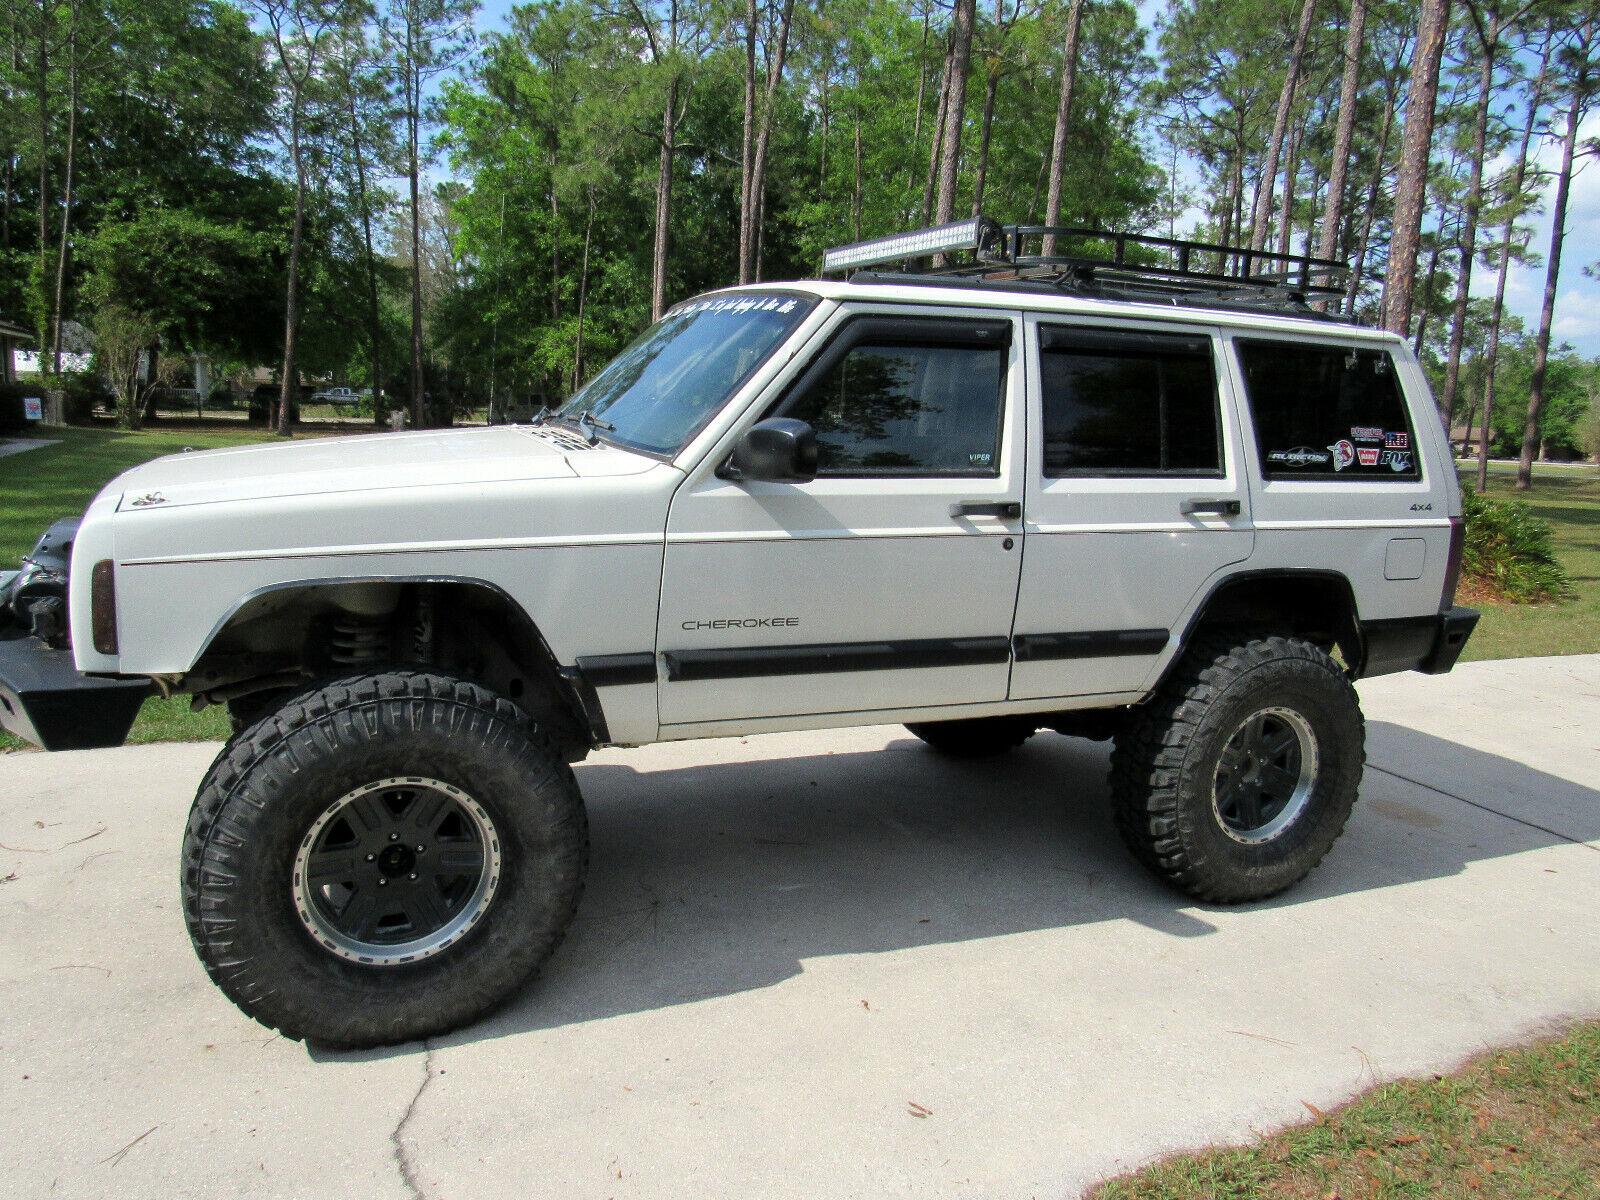 1998 Jeep Cherokee SPORT 1998 Jeep Cherokee Sport 4X4 4.0L 6 Cylinder Clean Low Miles! Runs great!